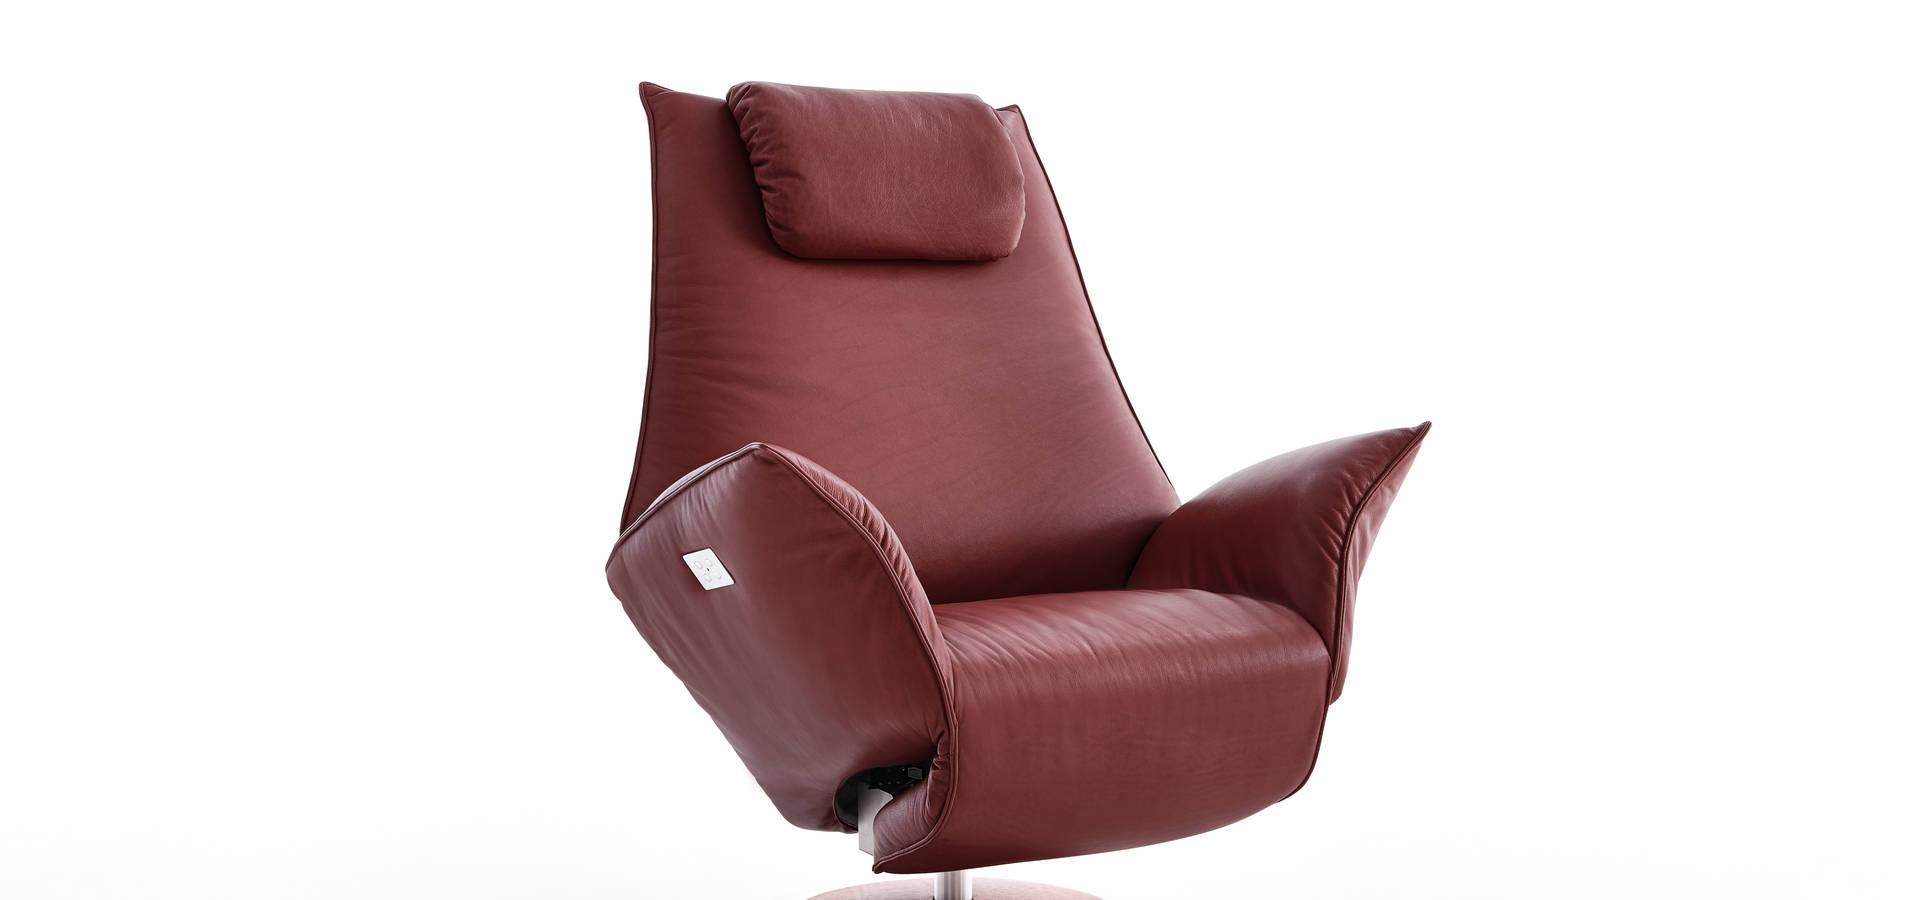 koinor polsterm bel gmbh co kg textilien polsterarbeiten in michelau homify. Black Bedroom Furniture Sets. Home Design Ideas